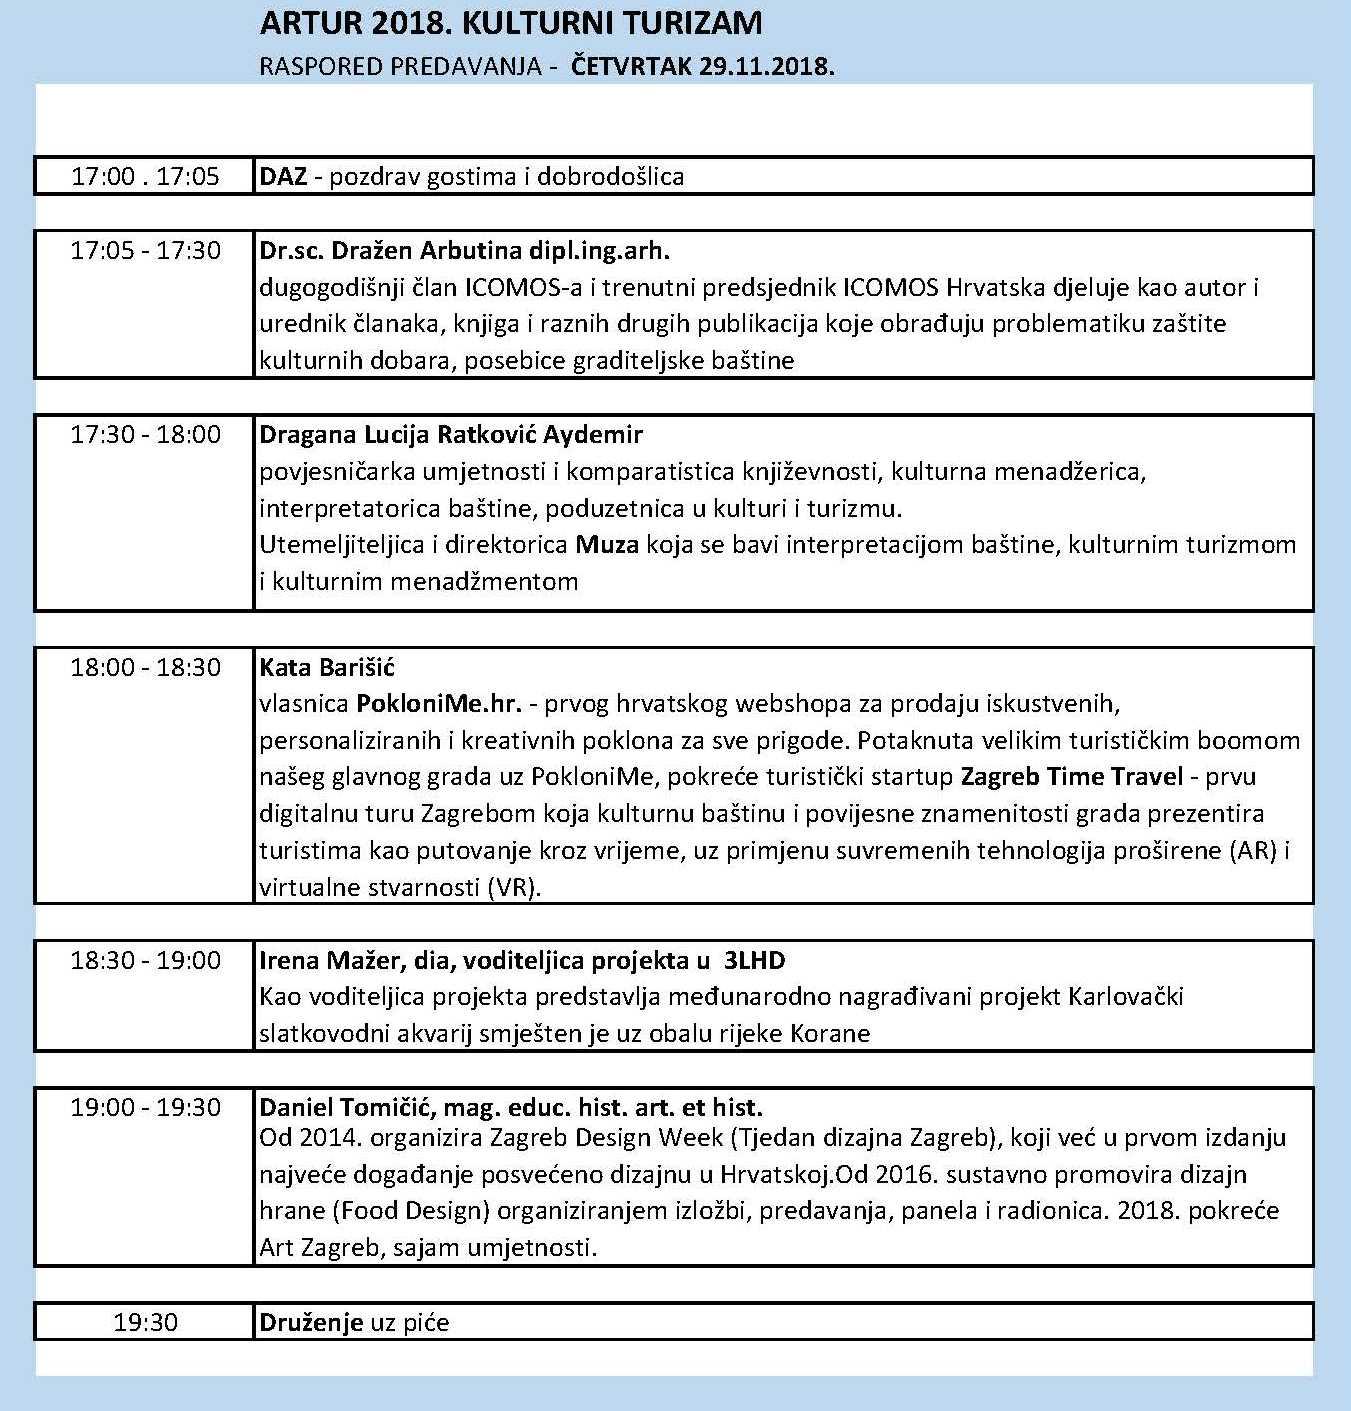 Jos O Konferenciji Artur 2018 Drustvo Arhitekata Zagreba